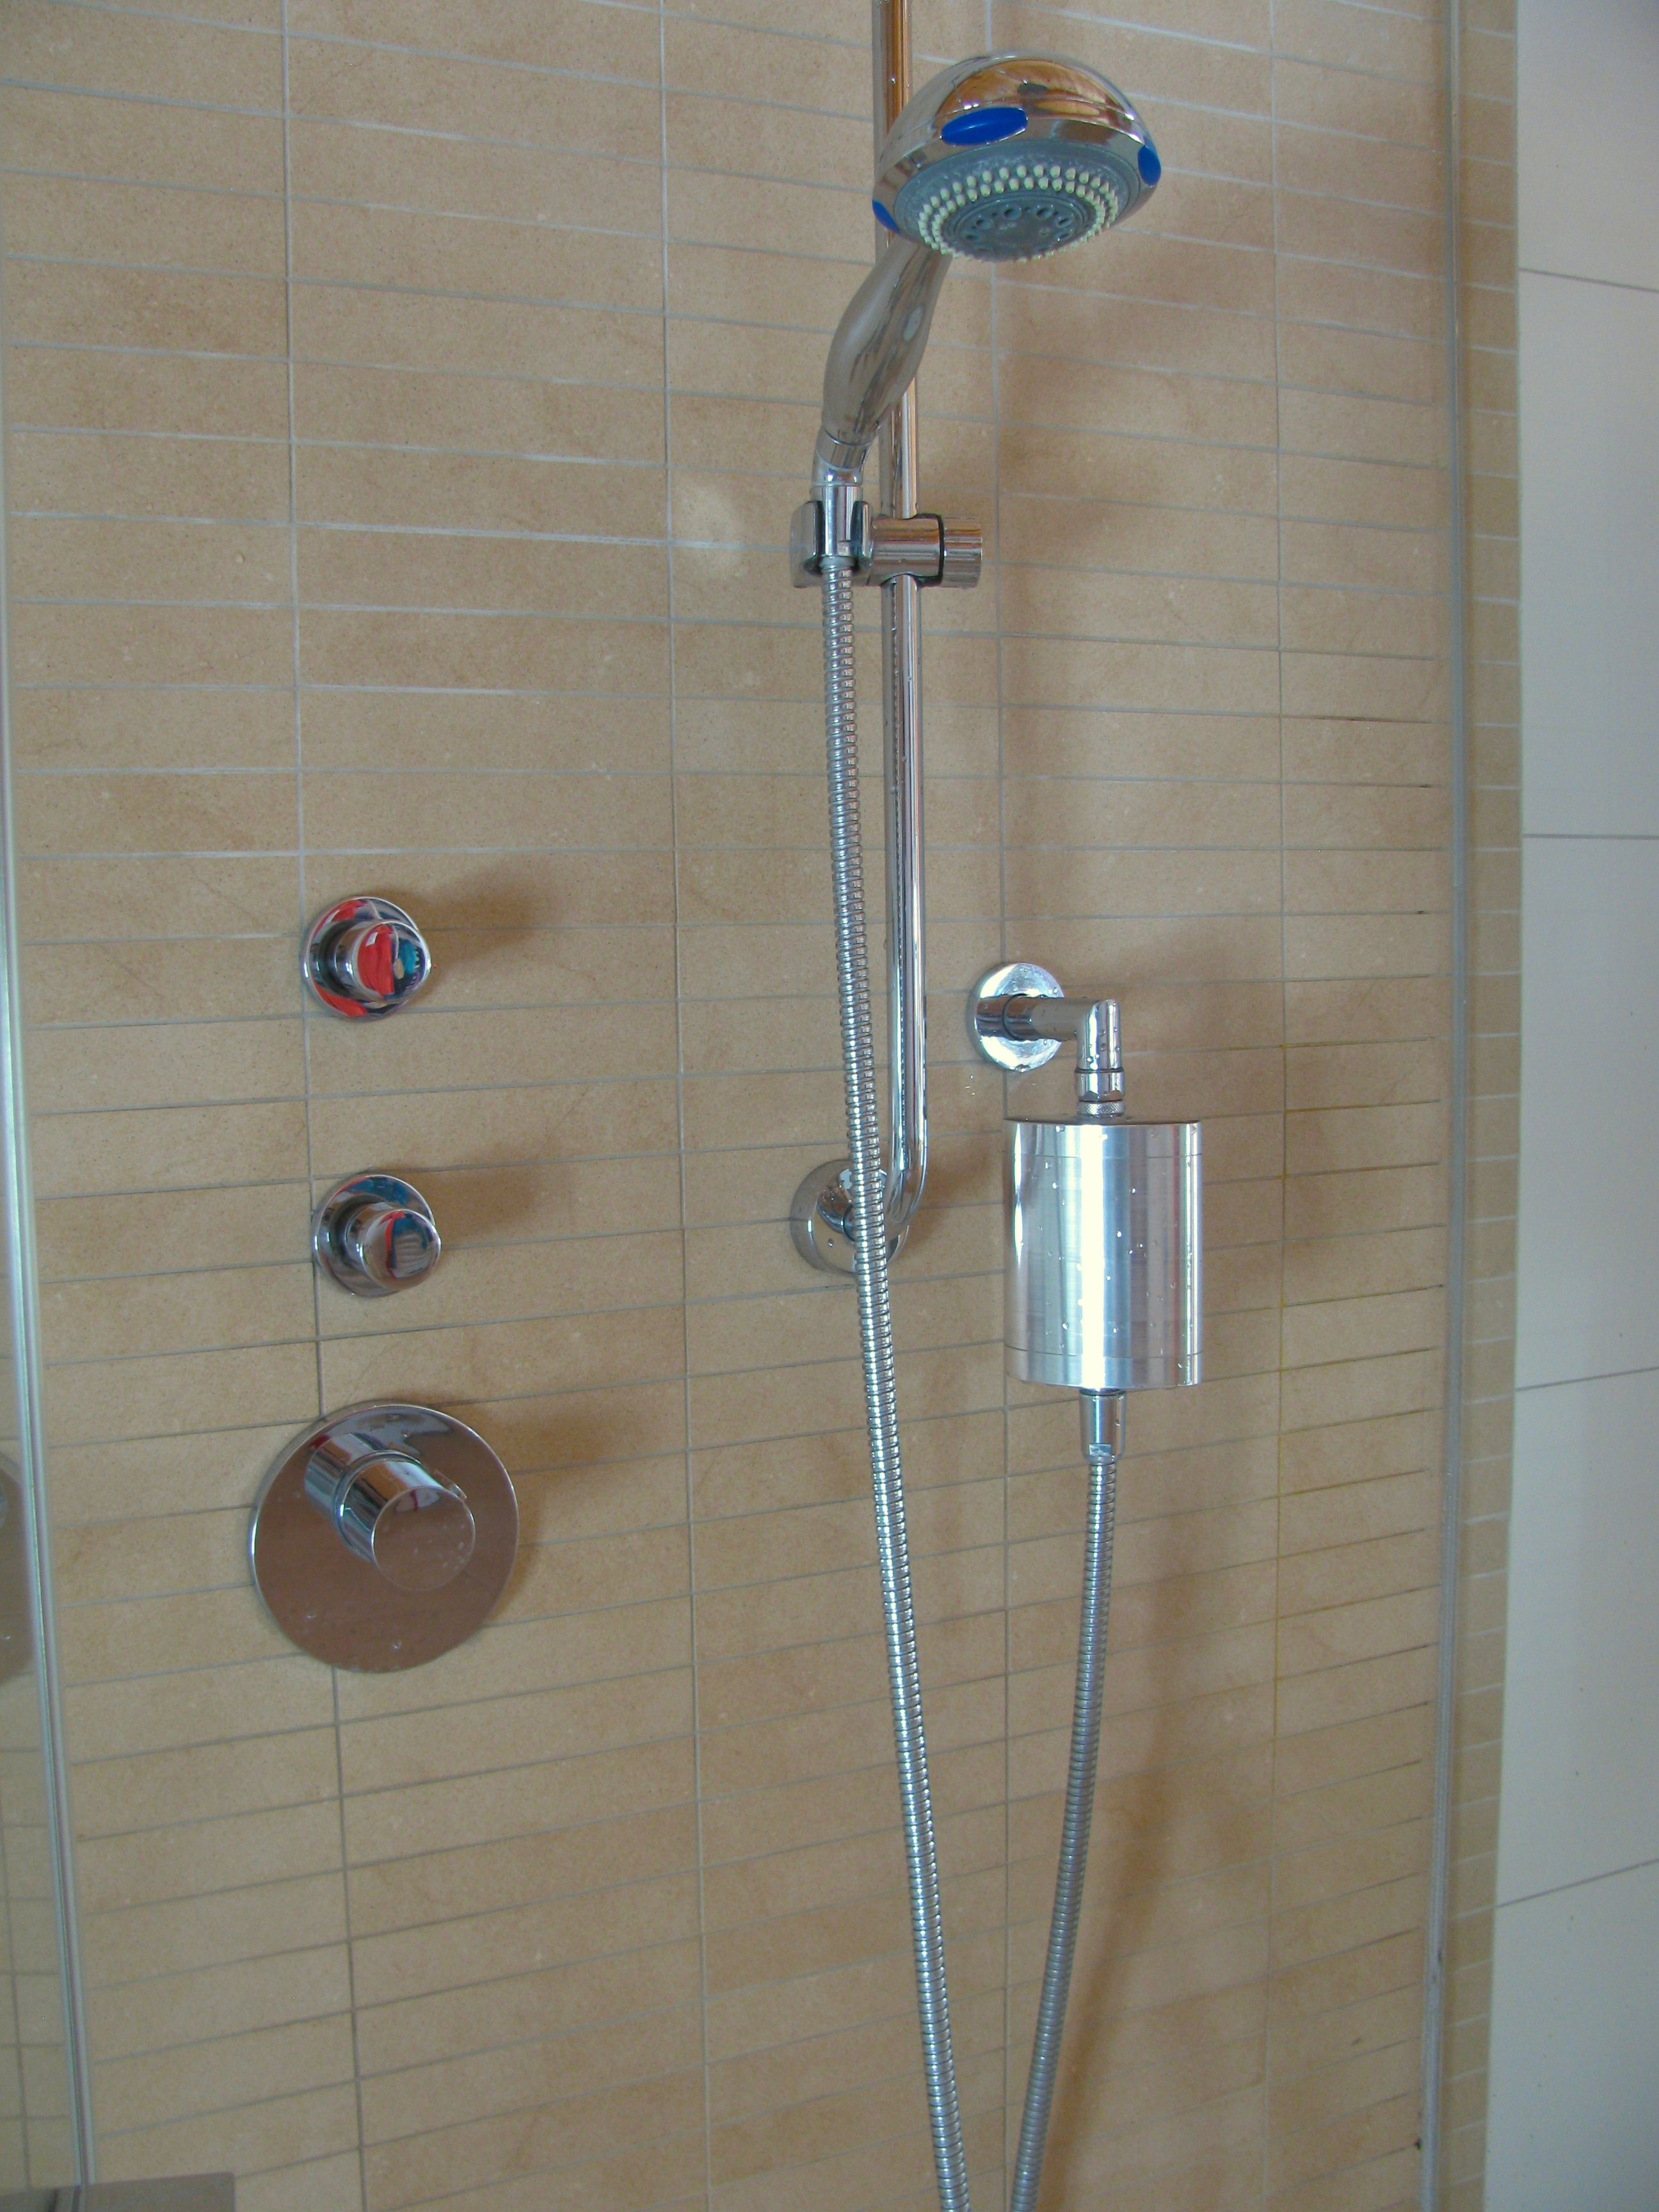 Adorable Rain Shower Head Installation With Brushed Nickel Shower Head Modern Rain Shower Head Installation For Bathroom Rain Shower Head Installation Rain Show